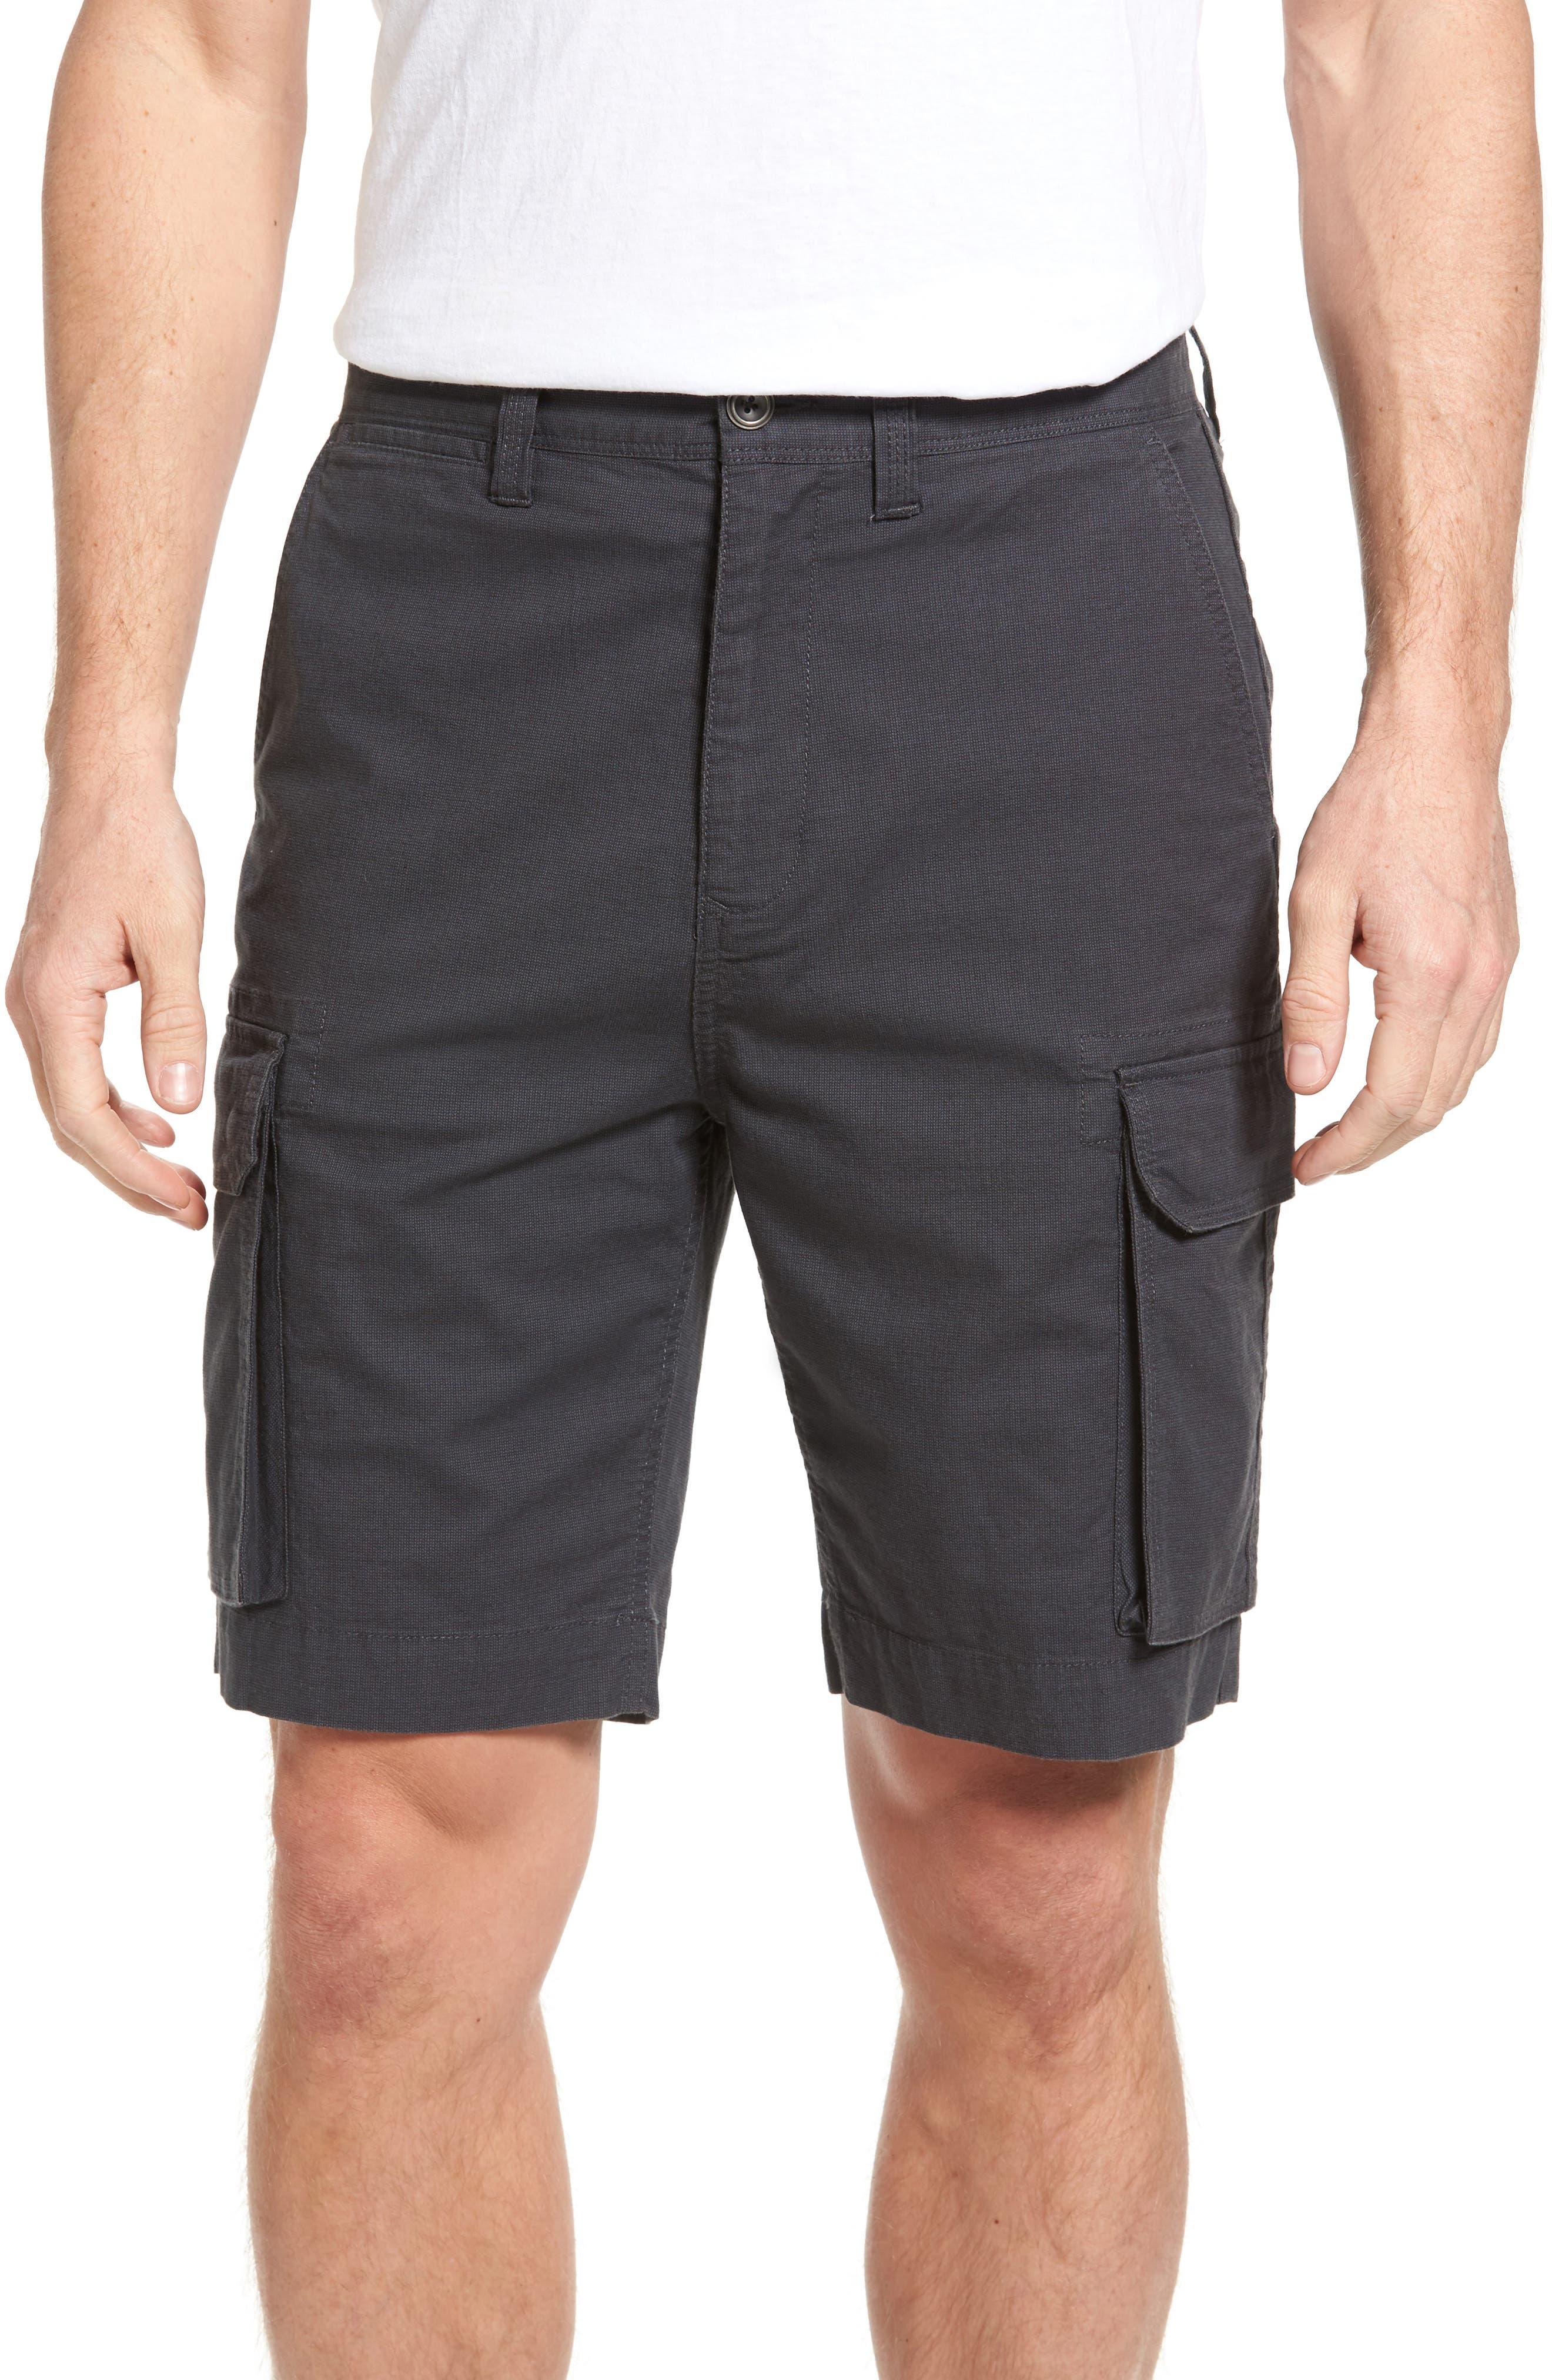 Ludstone Cargo Shorts,                             Main thumbnail 1, color,                             Blue Graphite